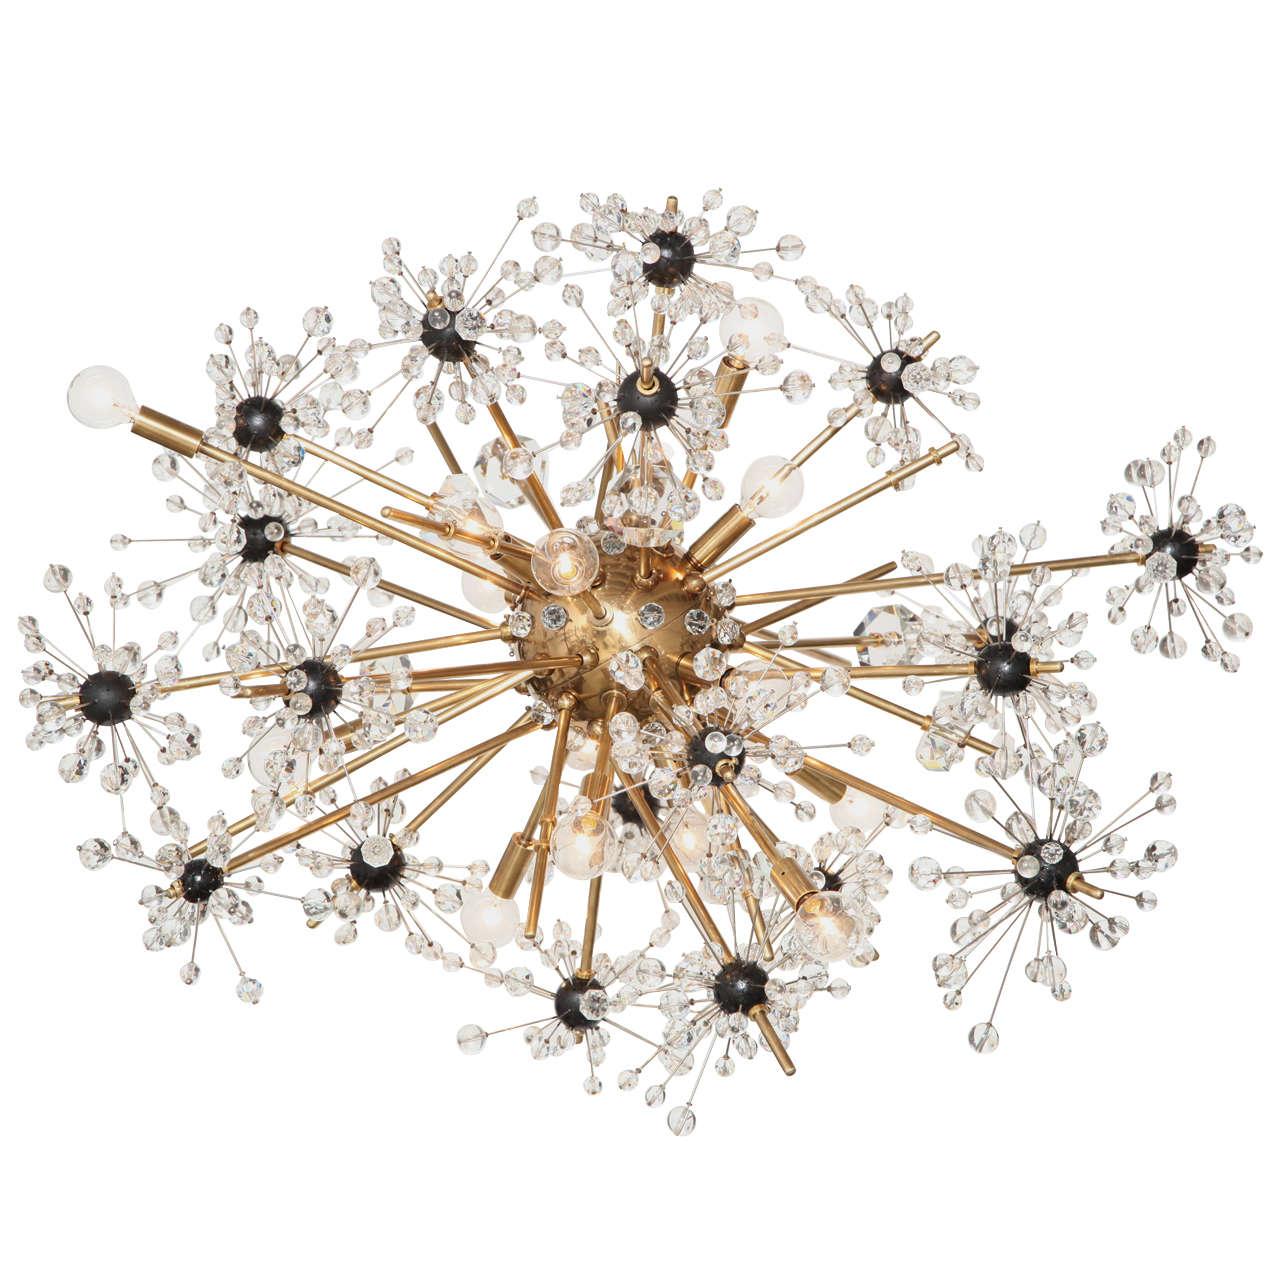 16 light lobmeyr metropolitan chandelier at 1stdibs 16 light lobmeyr metropolitan chandelier for sale aloadofball Gallery